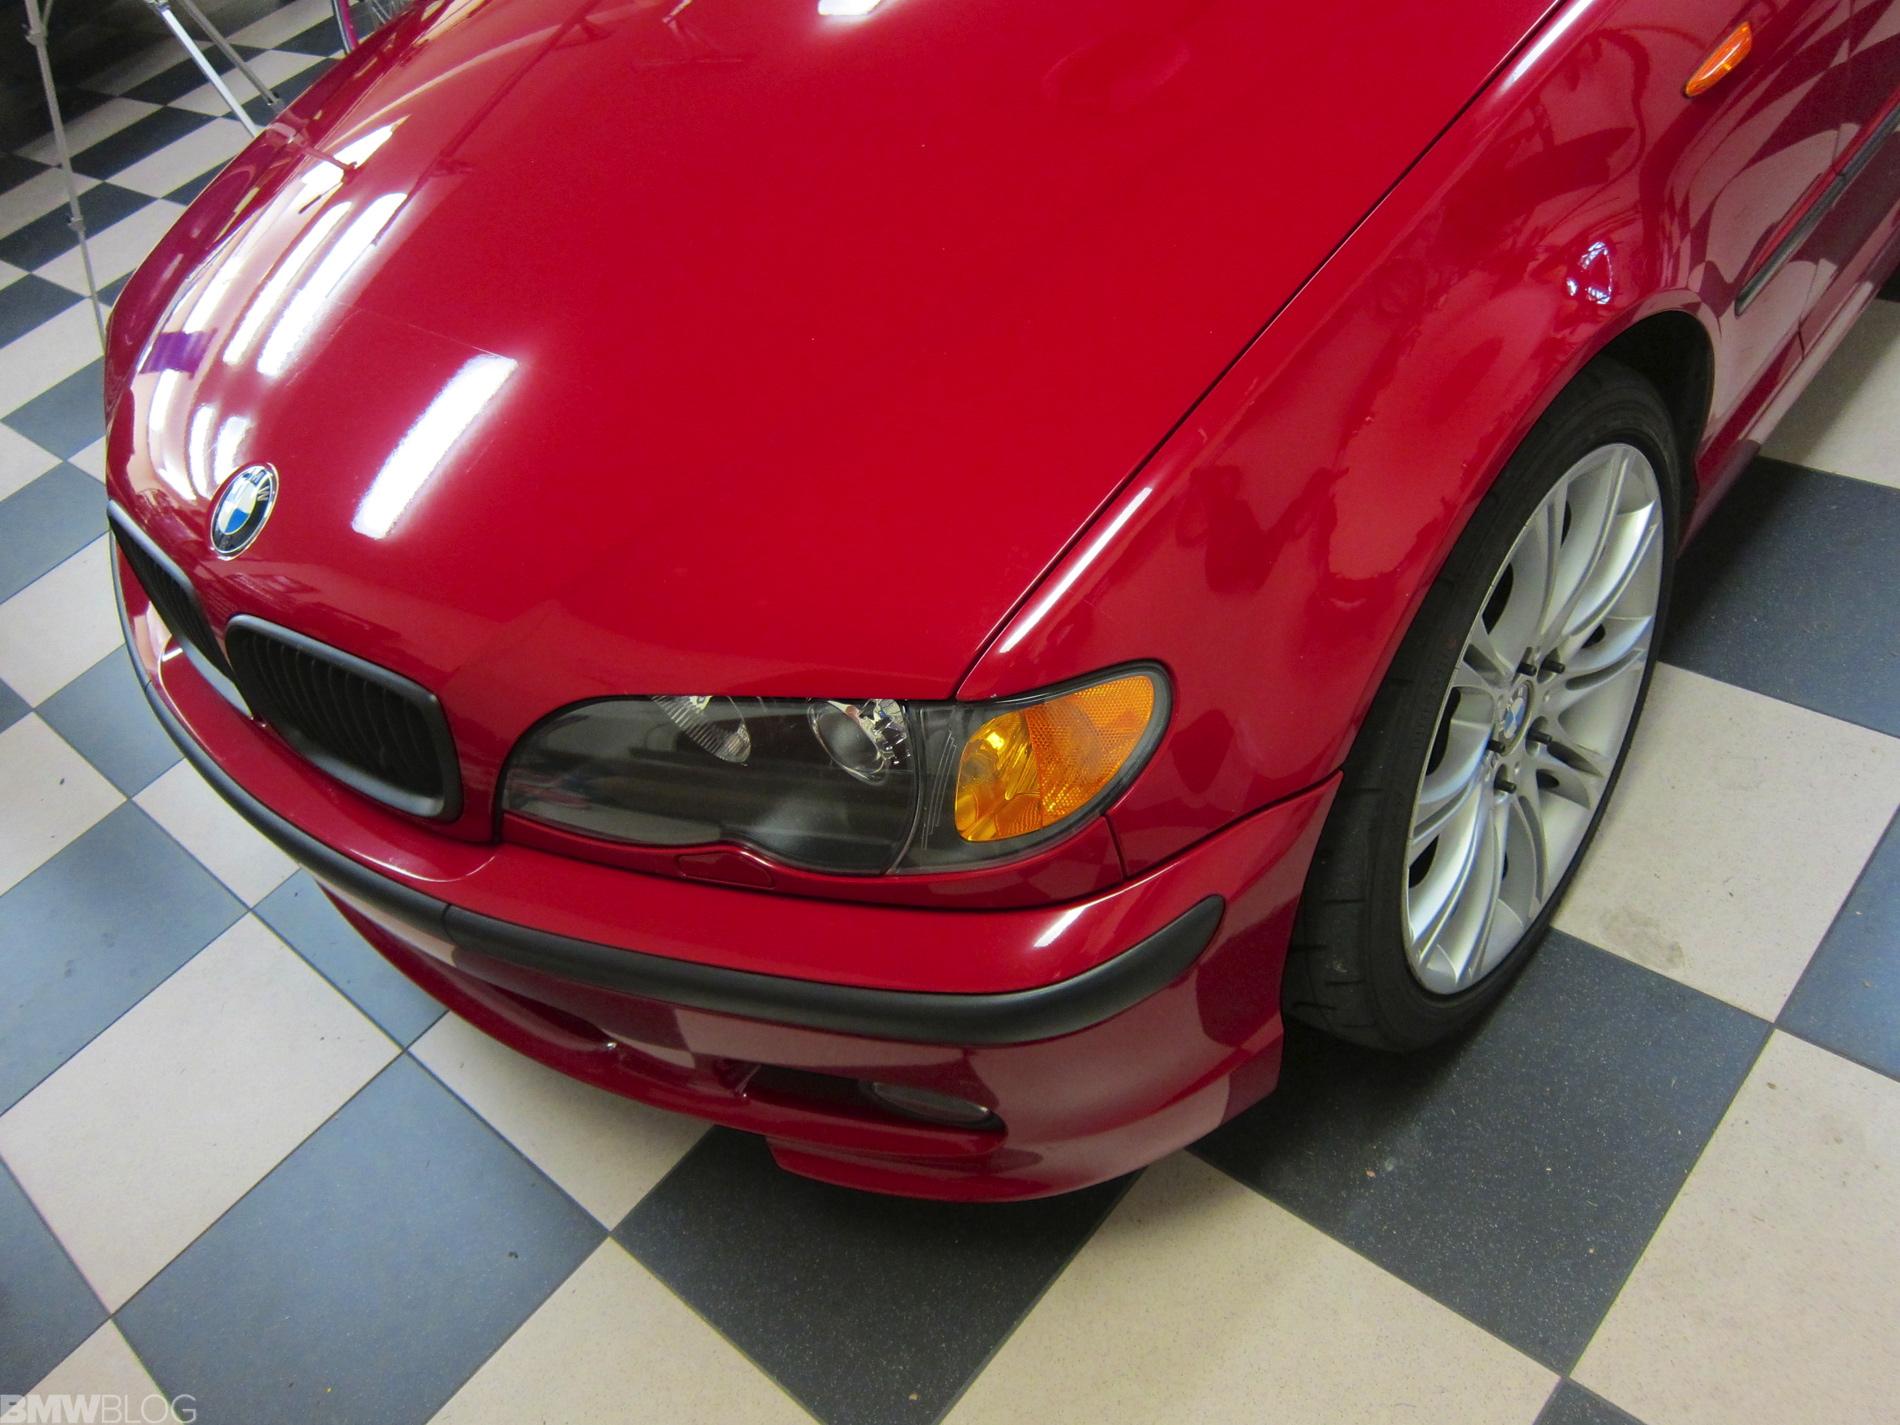 Best Car Wax To Buy